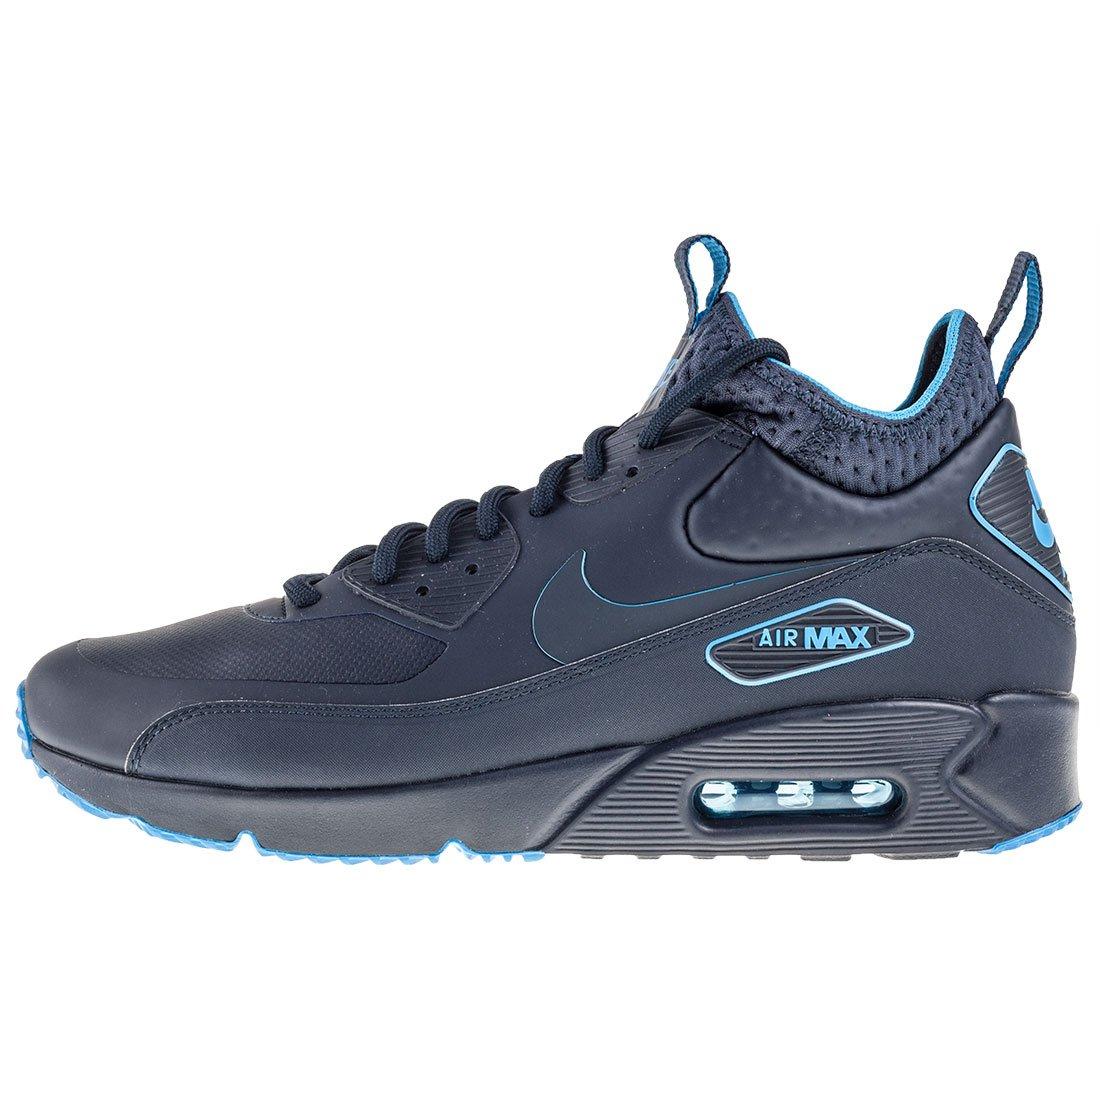 bb37c26b697 Nike Air Max 90 Ultra Mid Winter SE: Amazon.co.uk: Sports & Outdoors